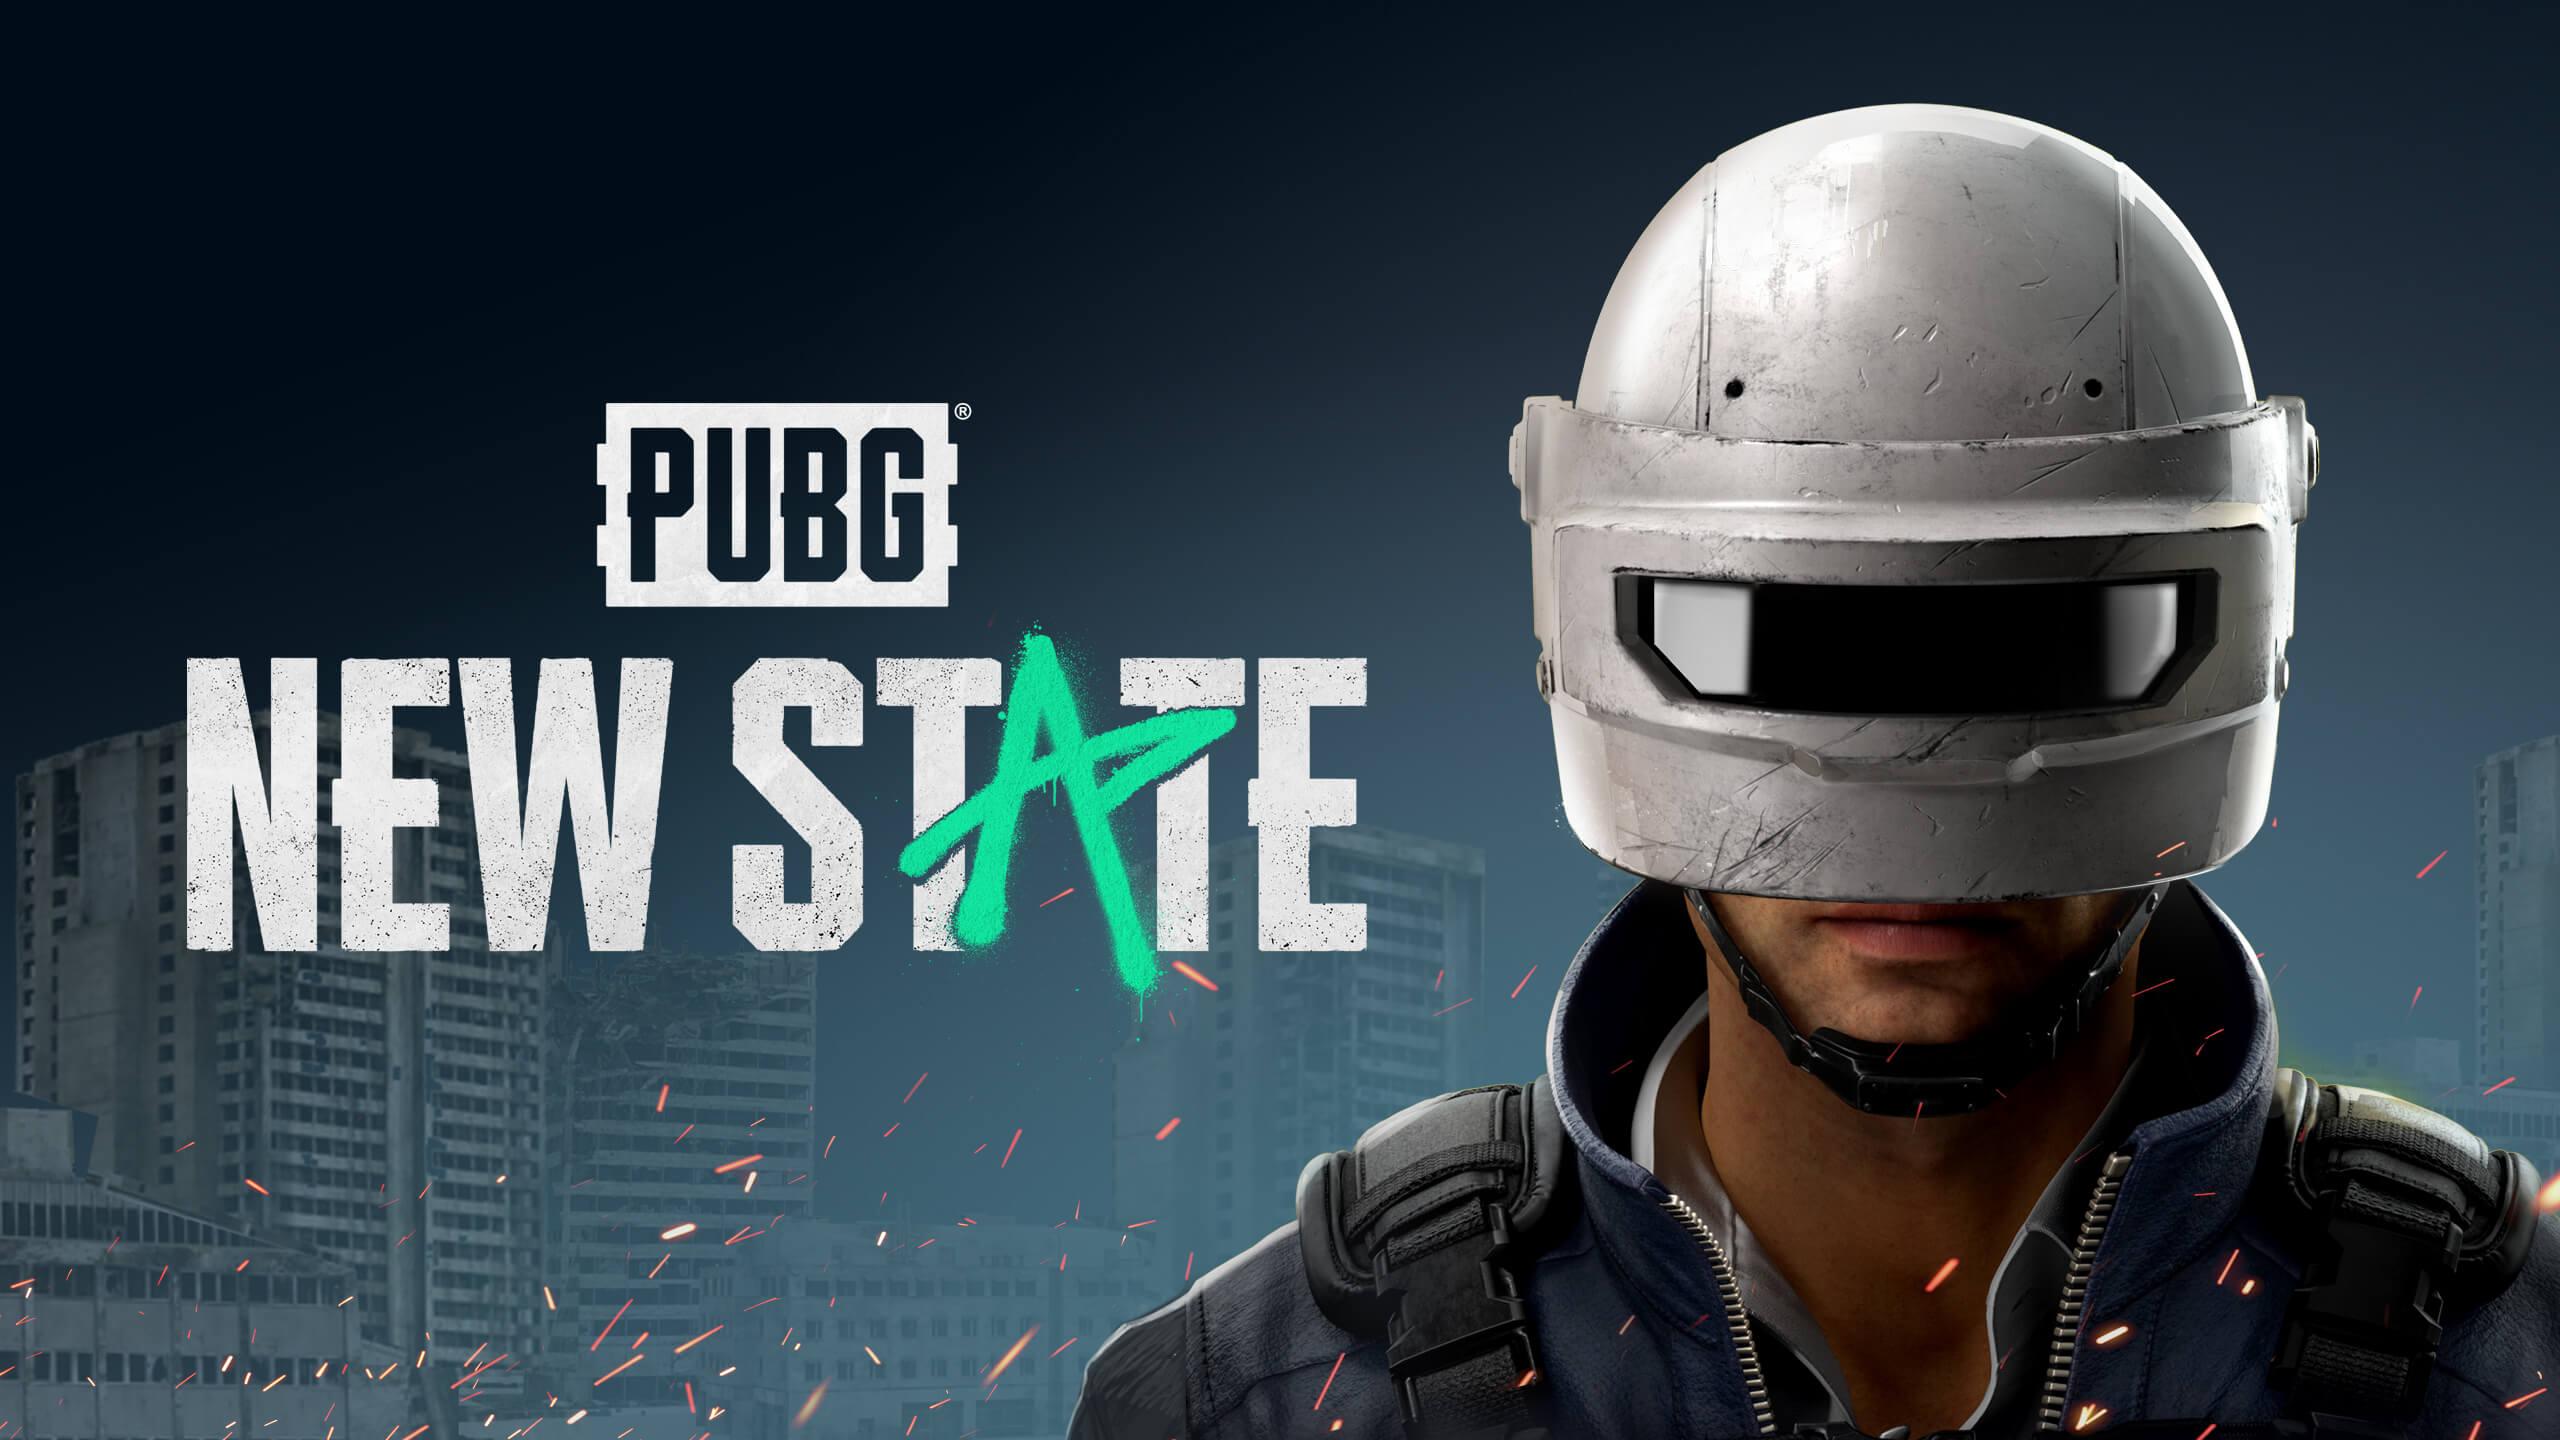 PUBG NEW STATE 1